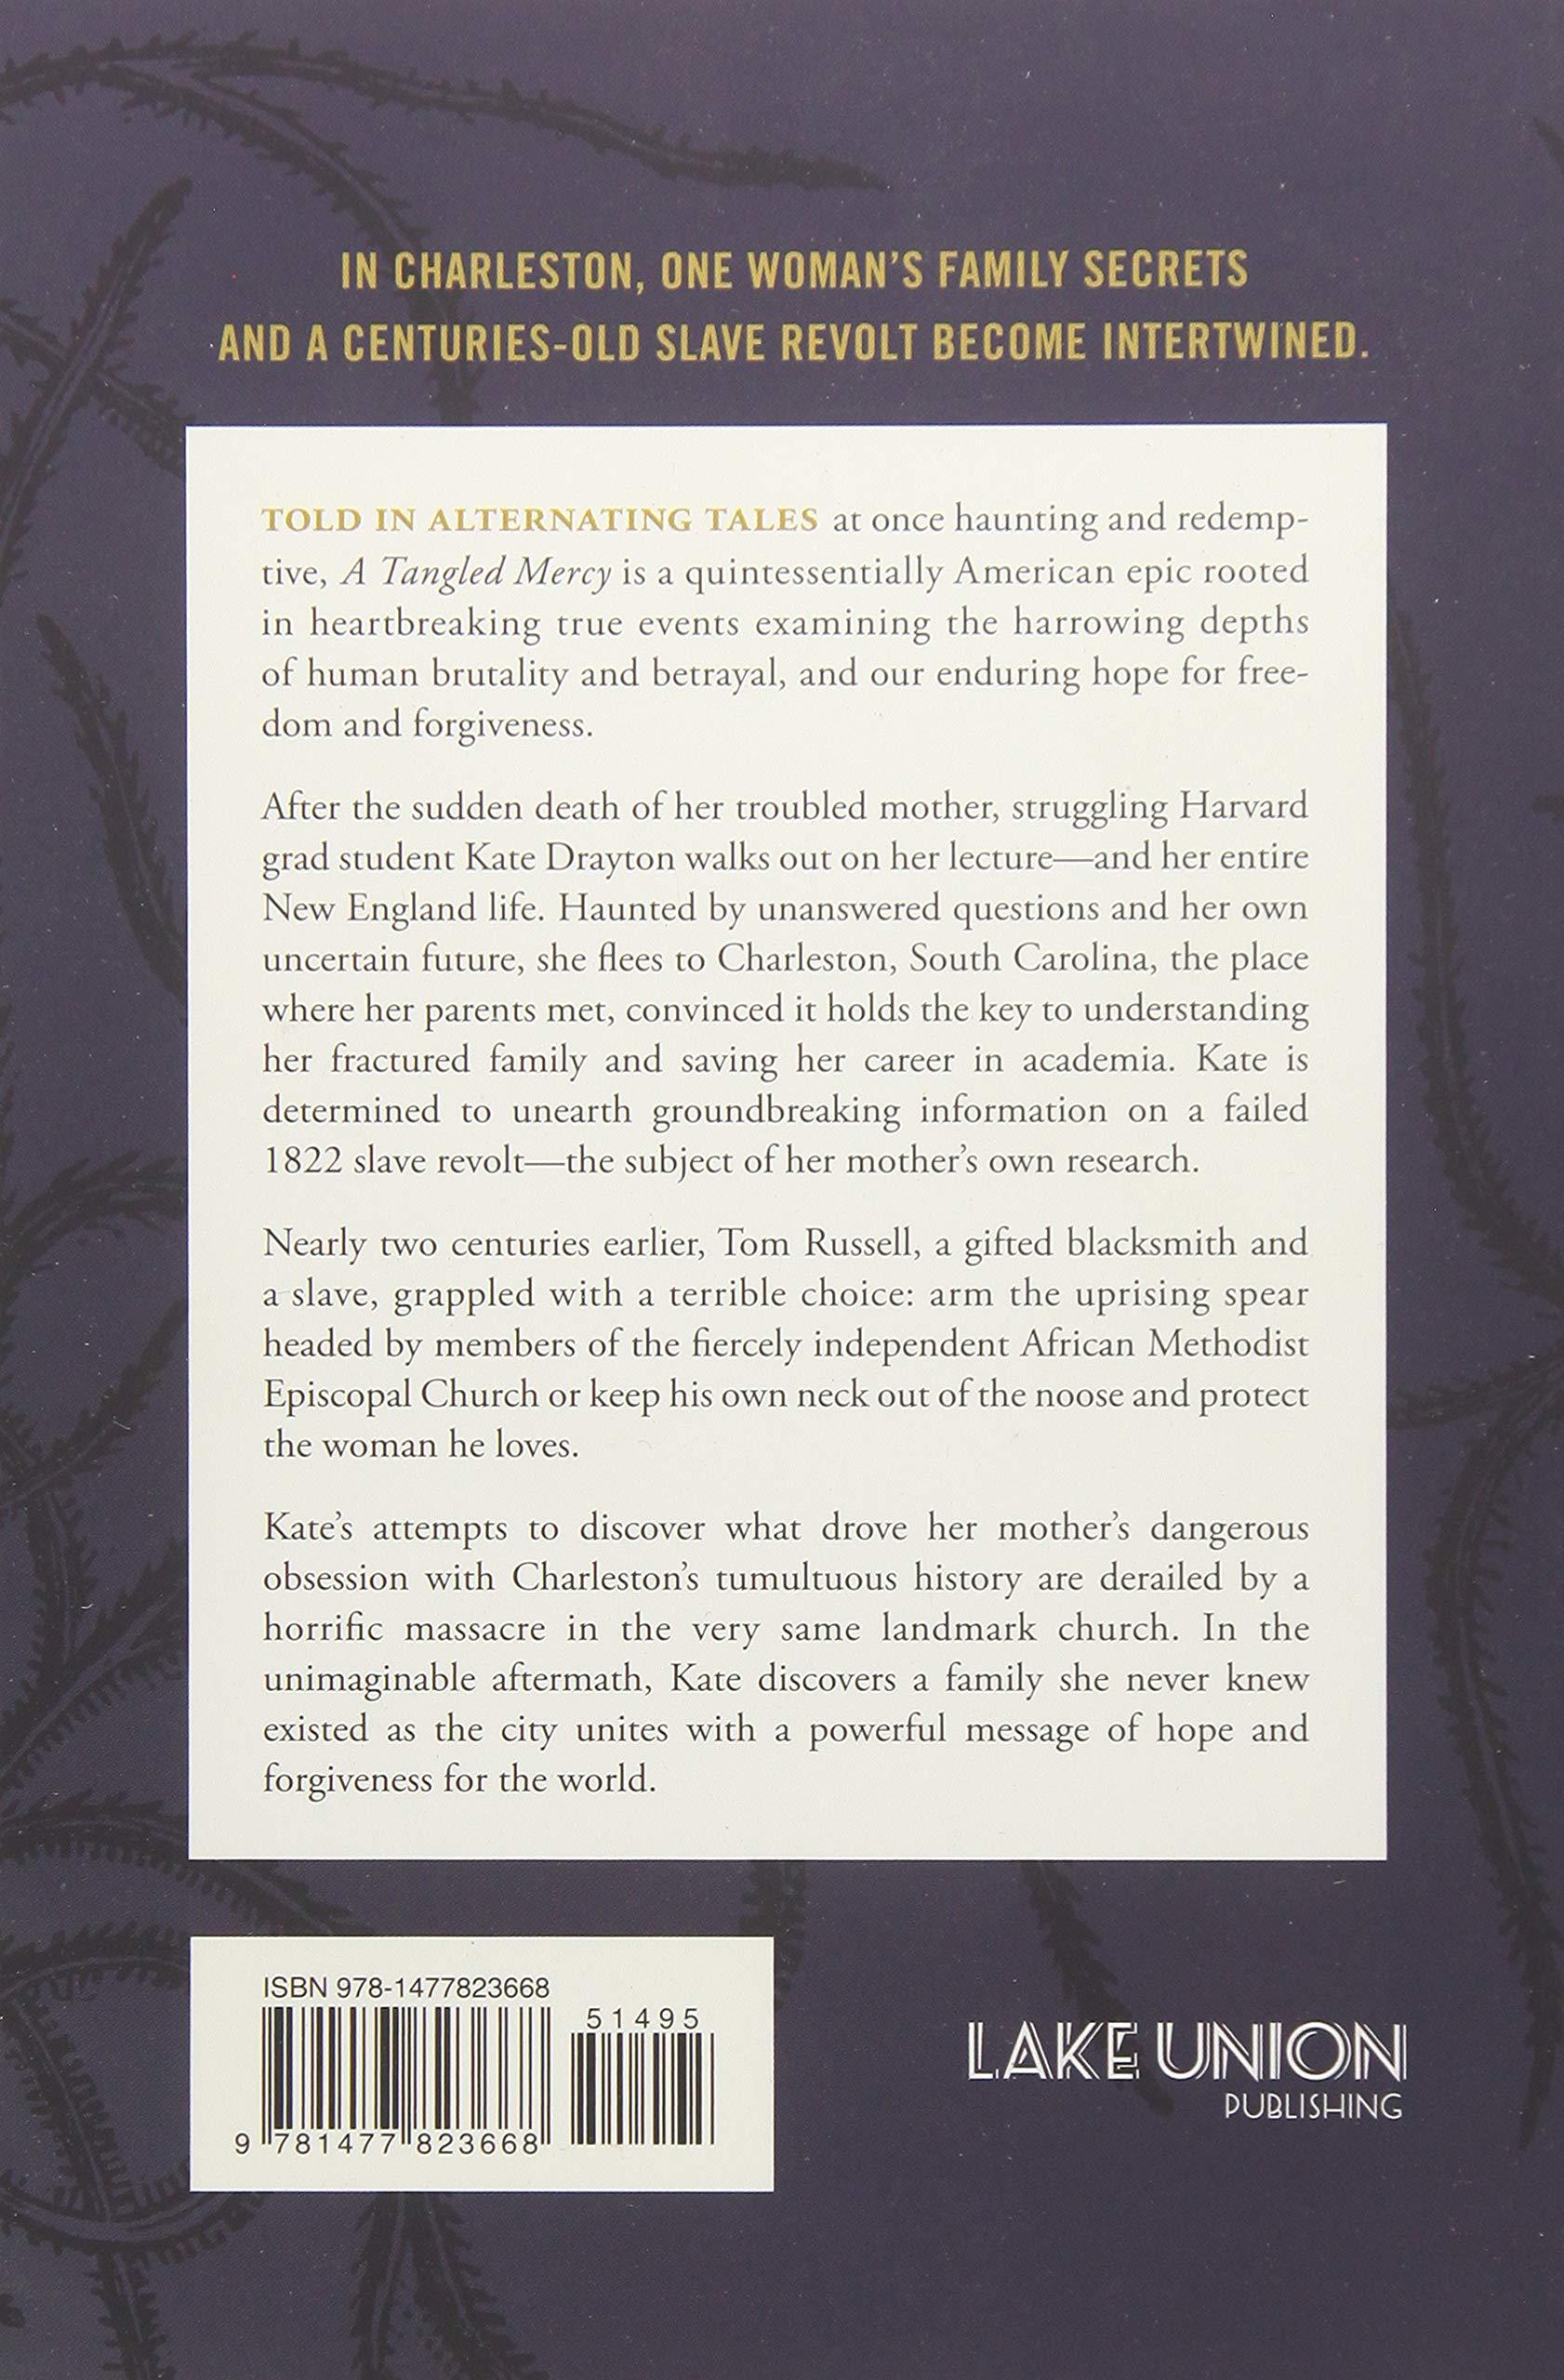 Amazon.com: A Tangled Mercy: A Novel (9781477823668): Joy Jordan-Lake: Books